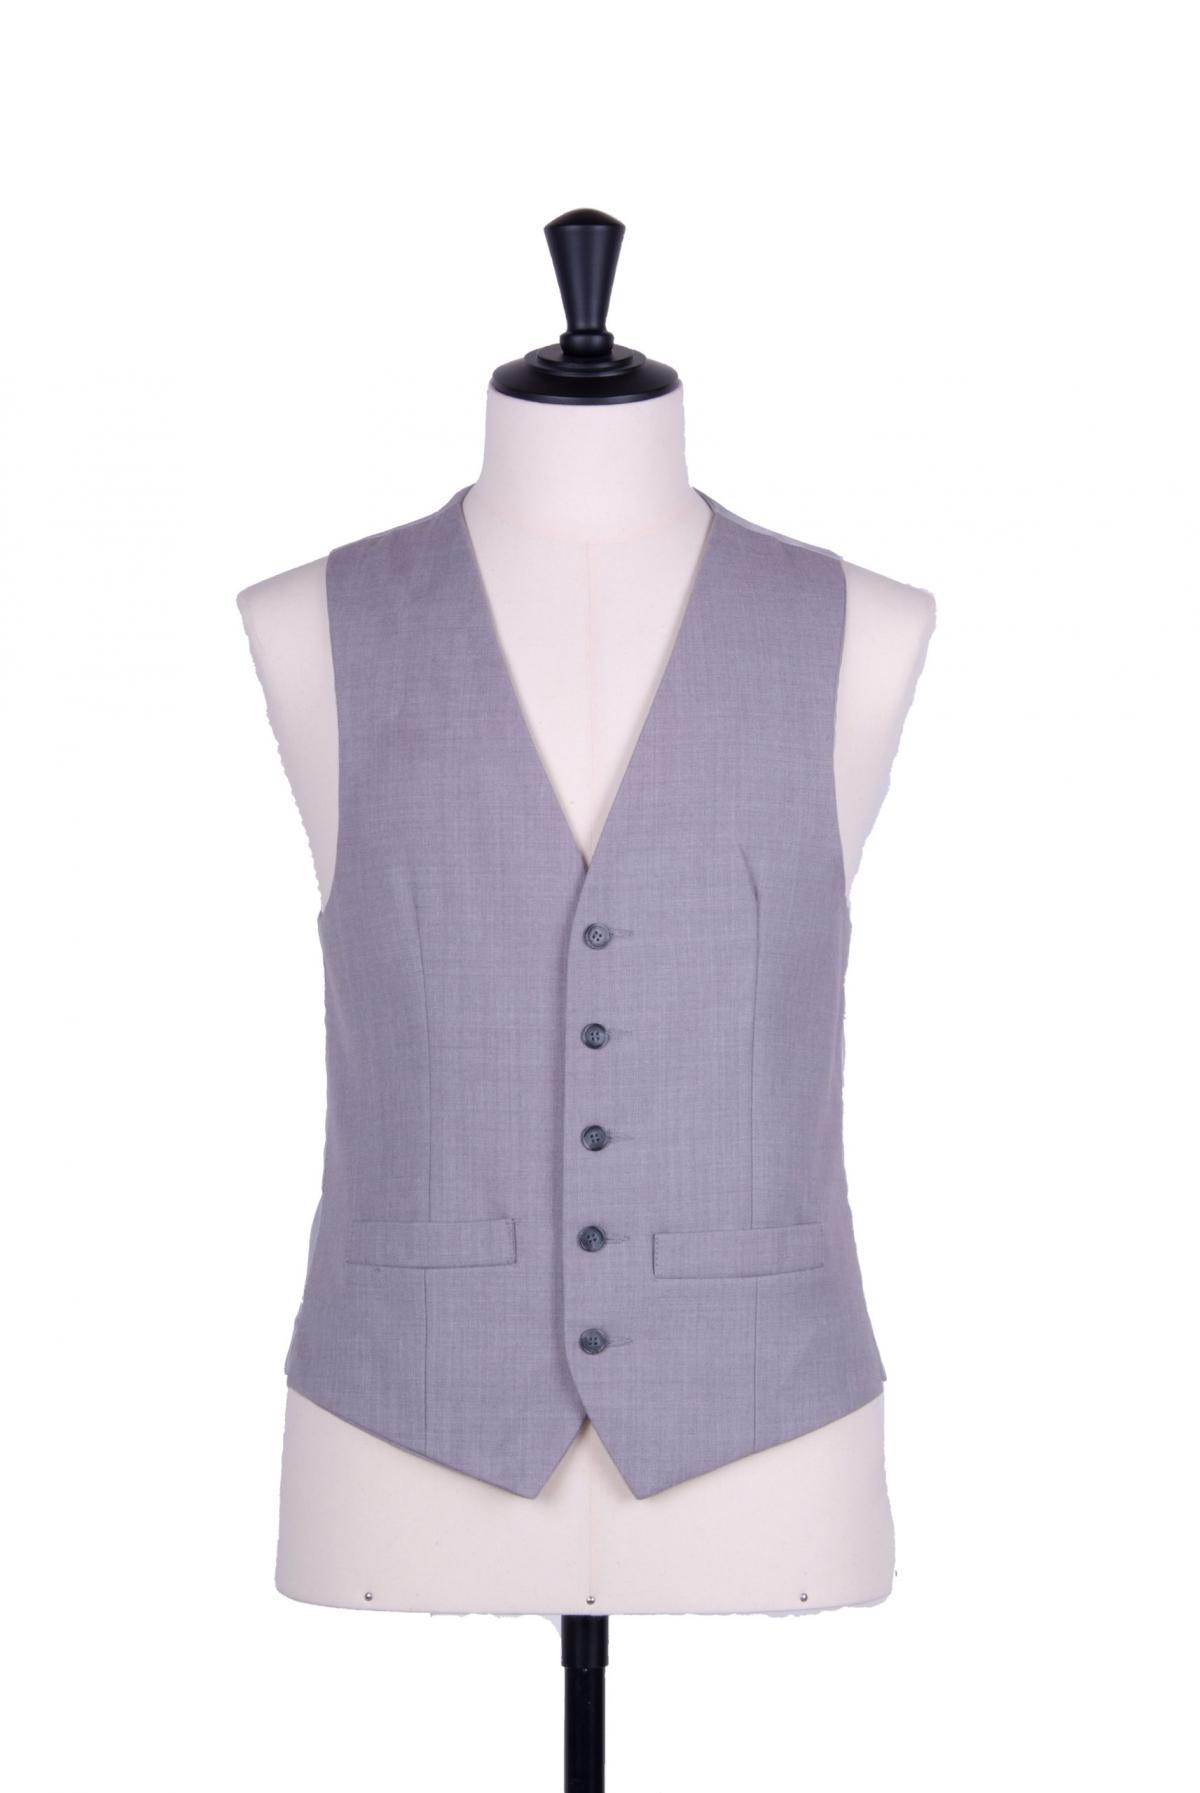 Anthony Formal wear retail website